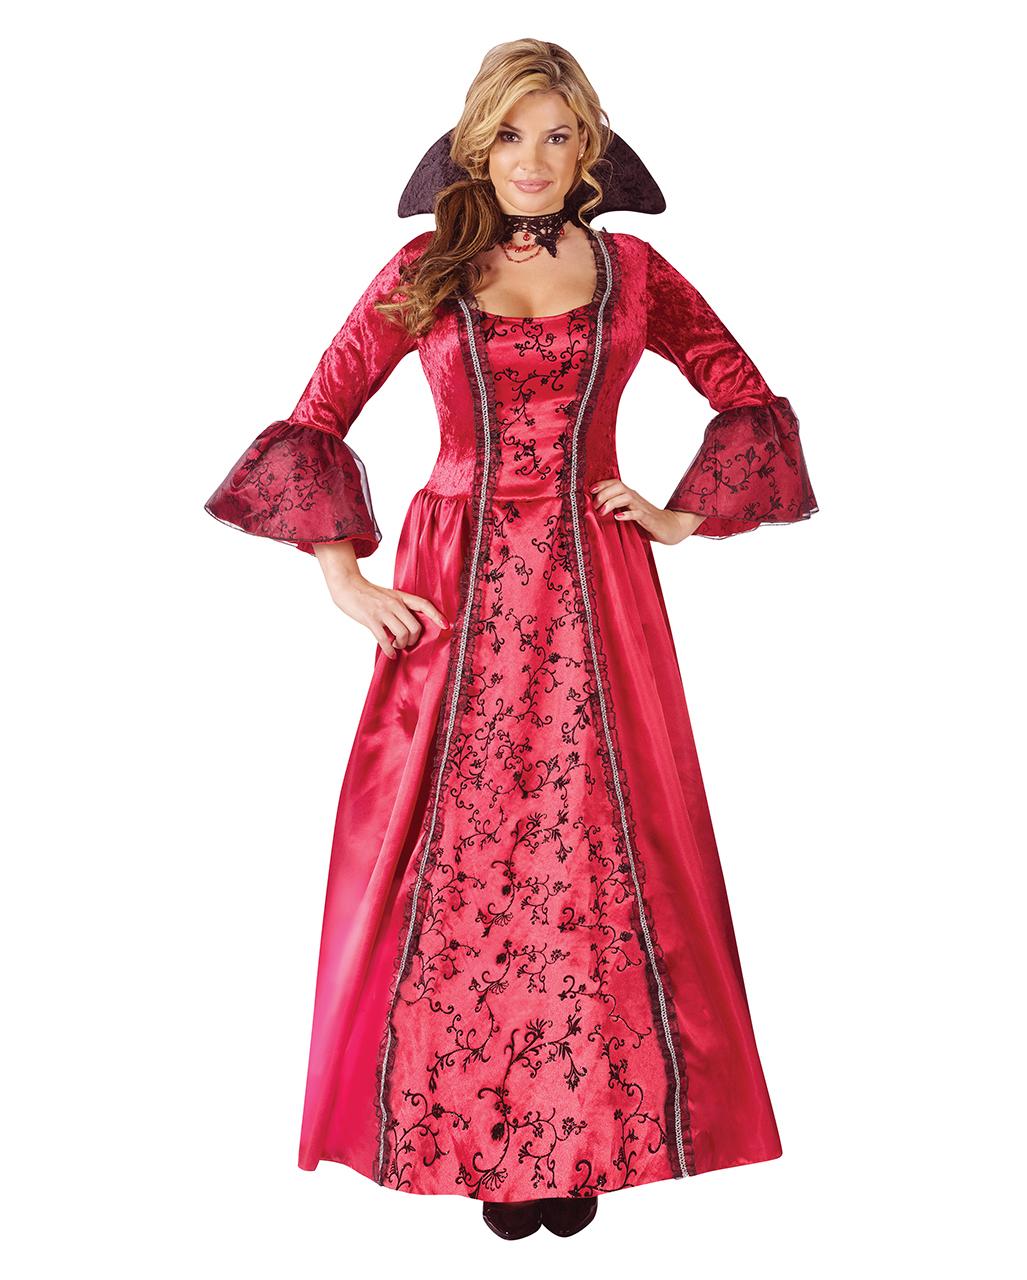 Dark Queen Costume S - Fairytale Costumes for Halloween & Carnival ...